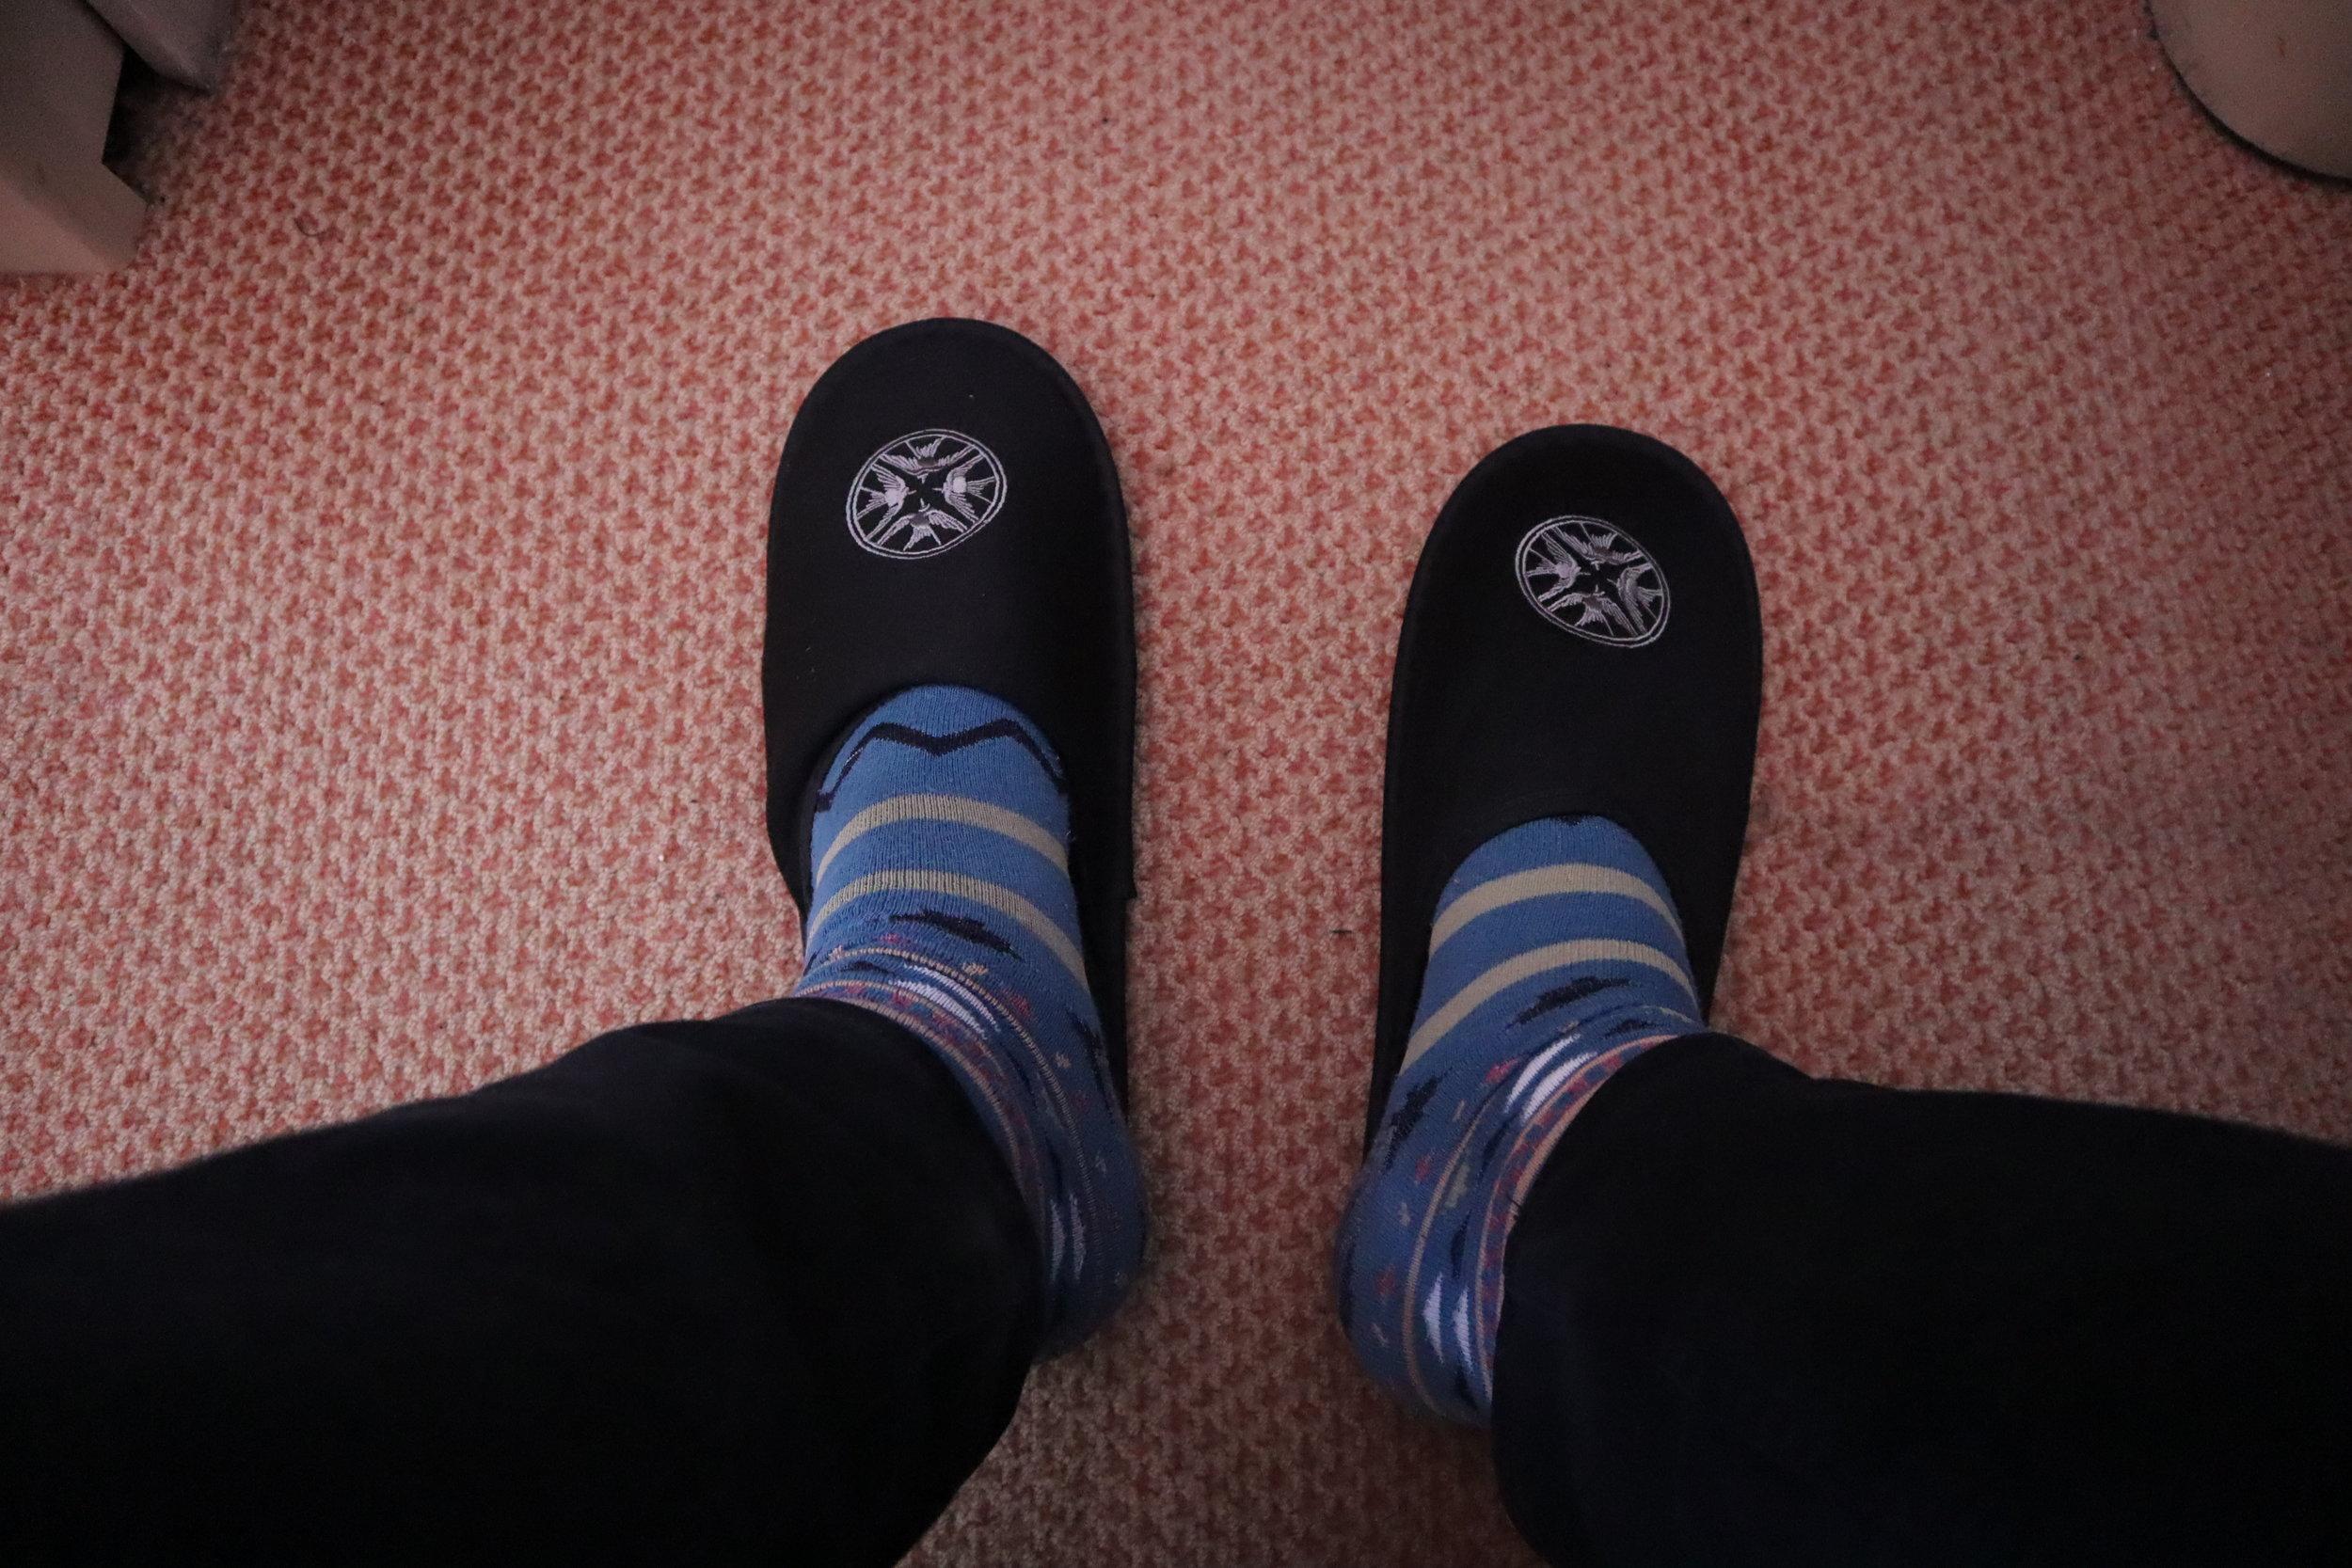 Singapore Airlines Suites Class – Lalique slippers